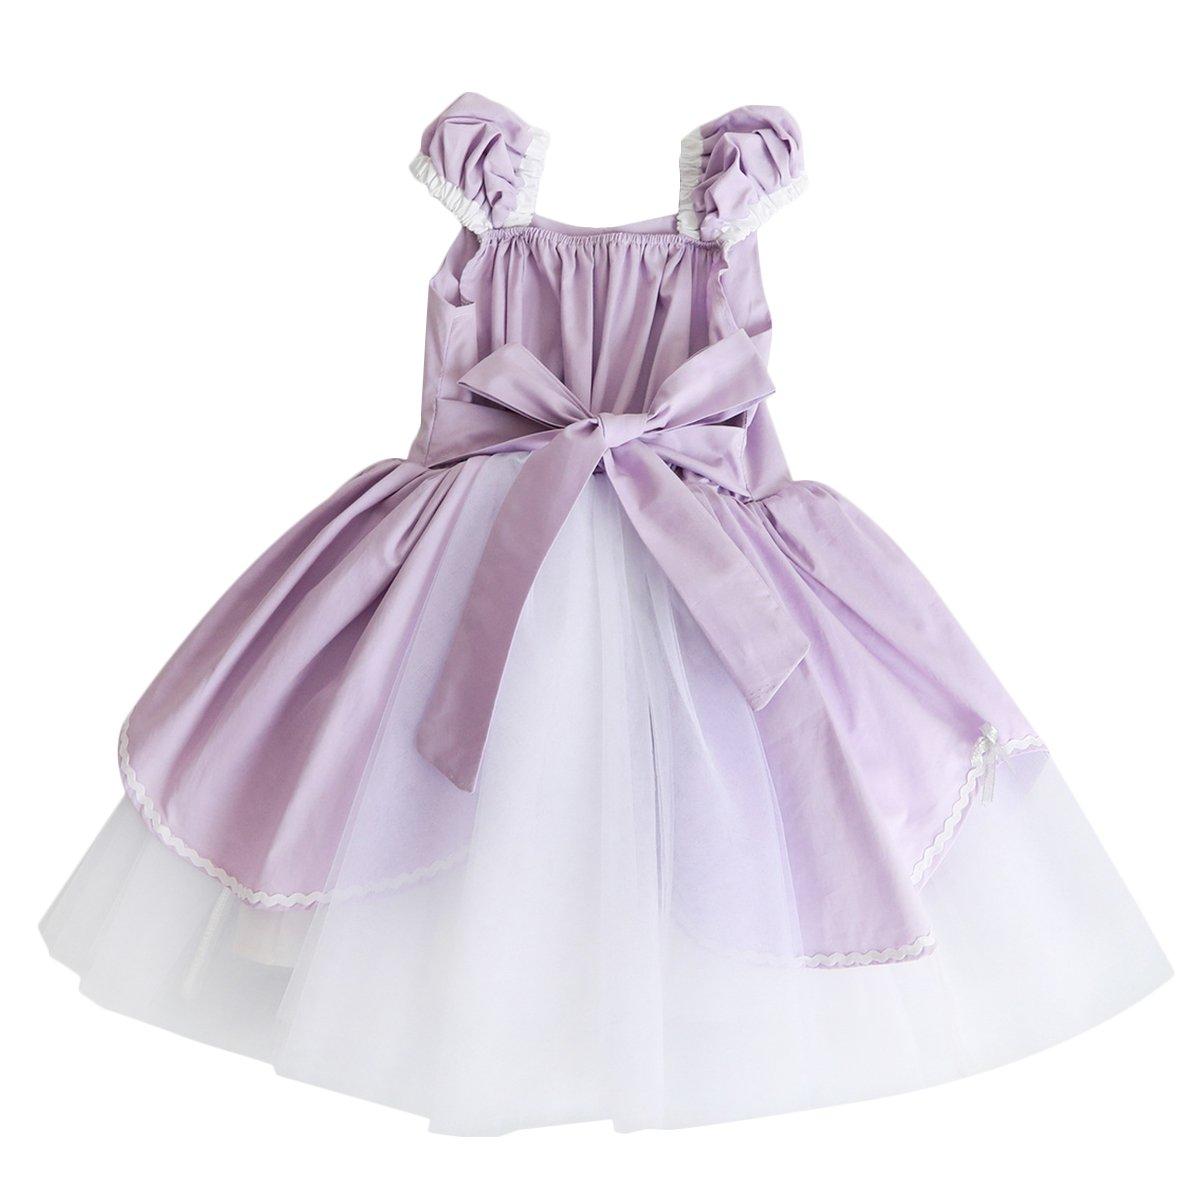 8f2e91c1f Kids Girls Princess Costume Cosplay Party Fancy Dress Up Aurora ...